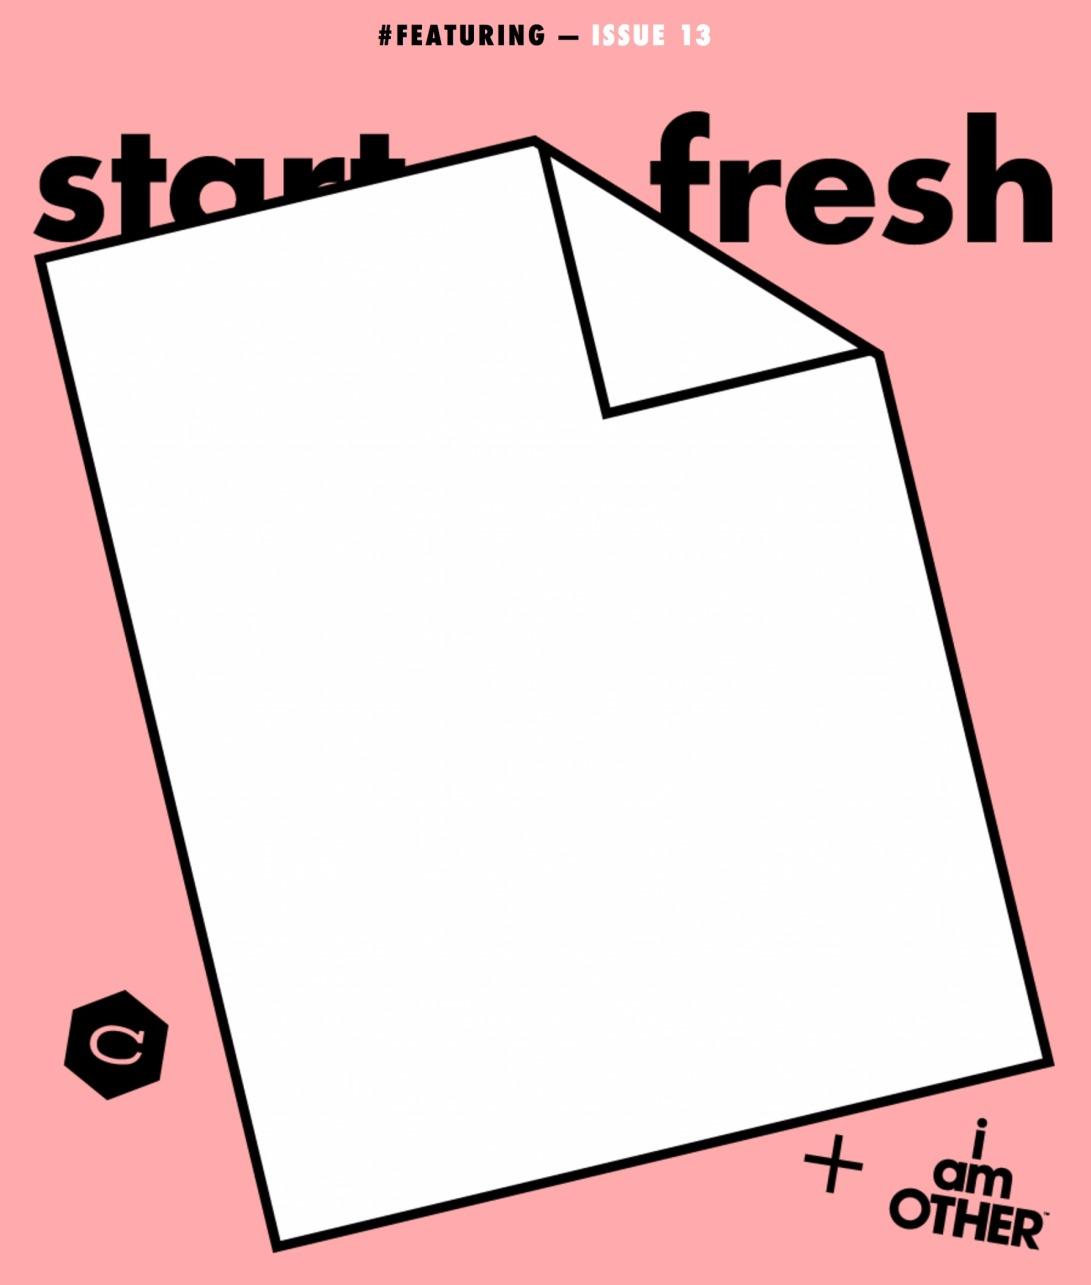 Featuring: Start Fresh ✨